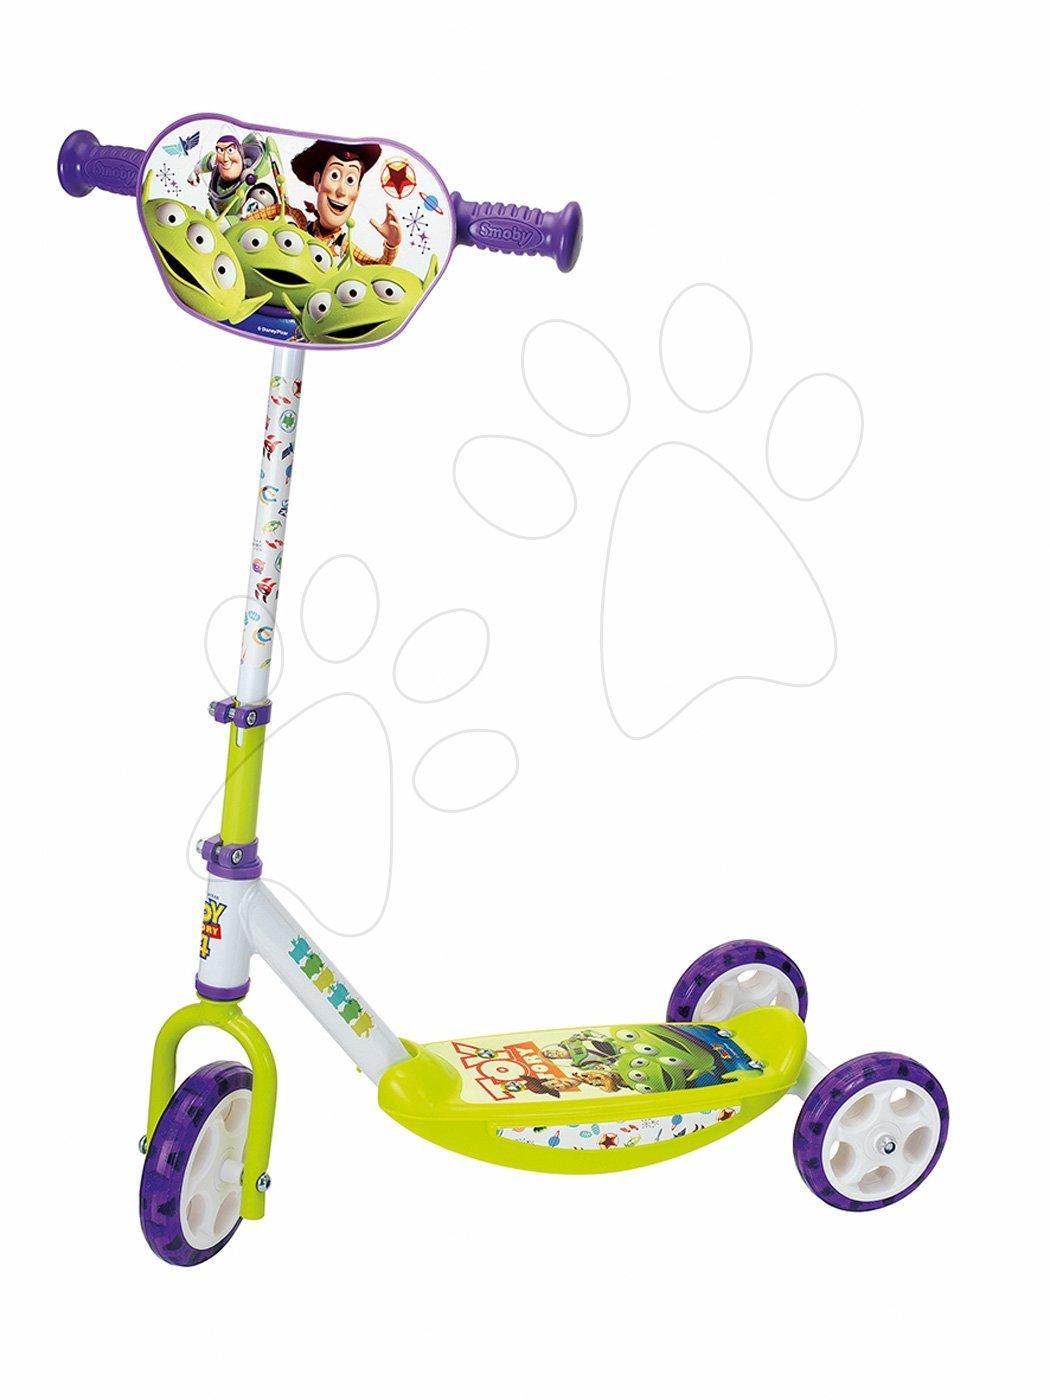 Trojkolesová kolobežka Toy Story Disney Smoby s výškovo nastaviteľnou rúčkou, protišmyková